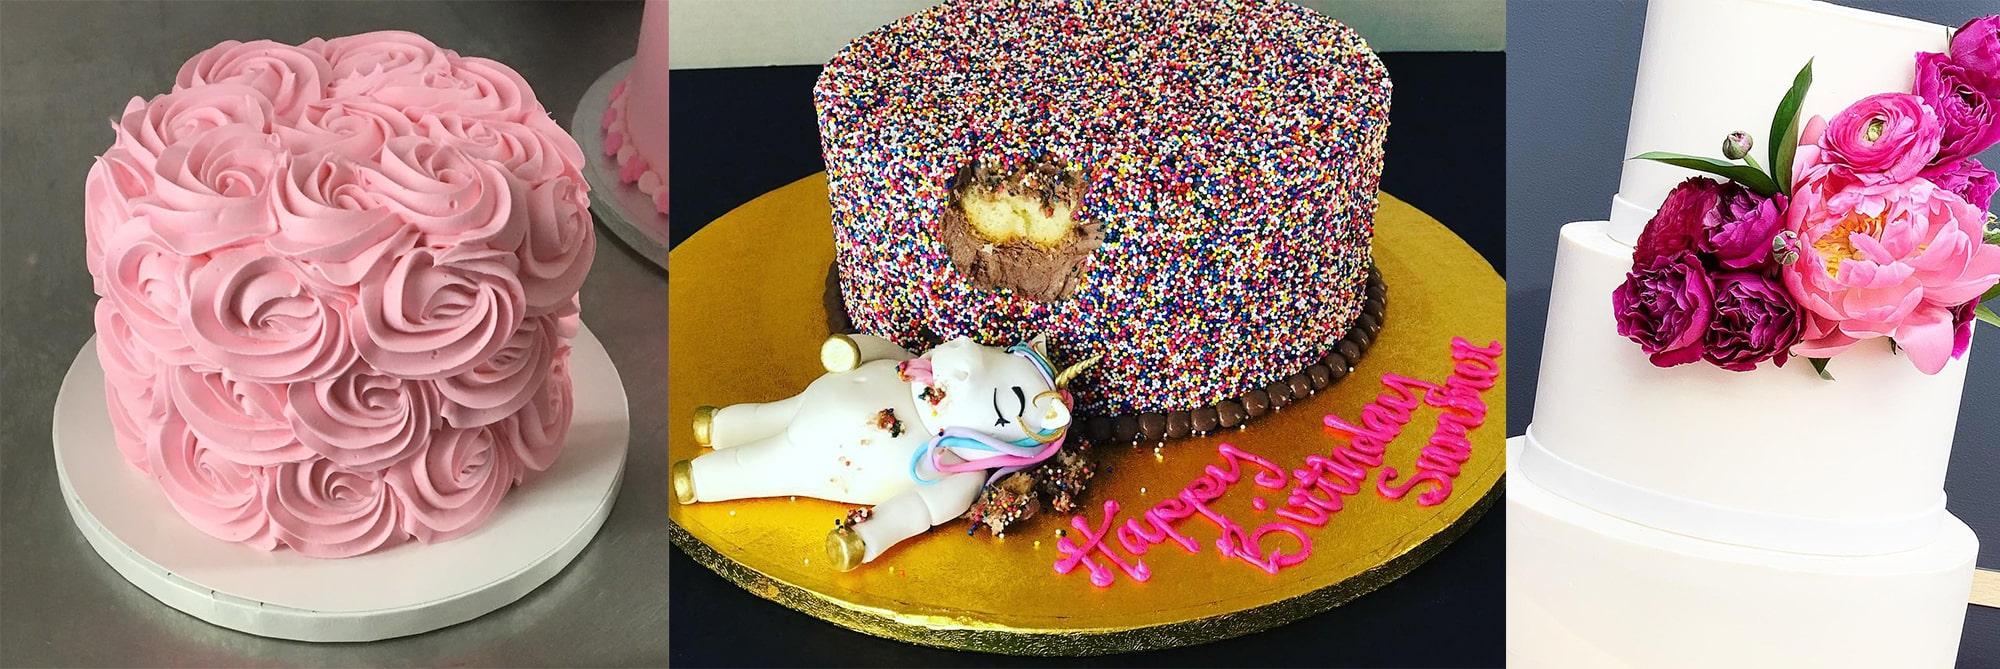 Phenomenal 14 Top Bakeries In Columbus Ohio Personalised Birthday Cards Veneteletsinfo